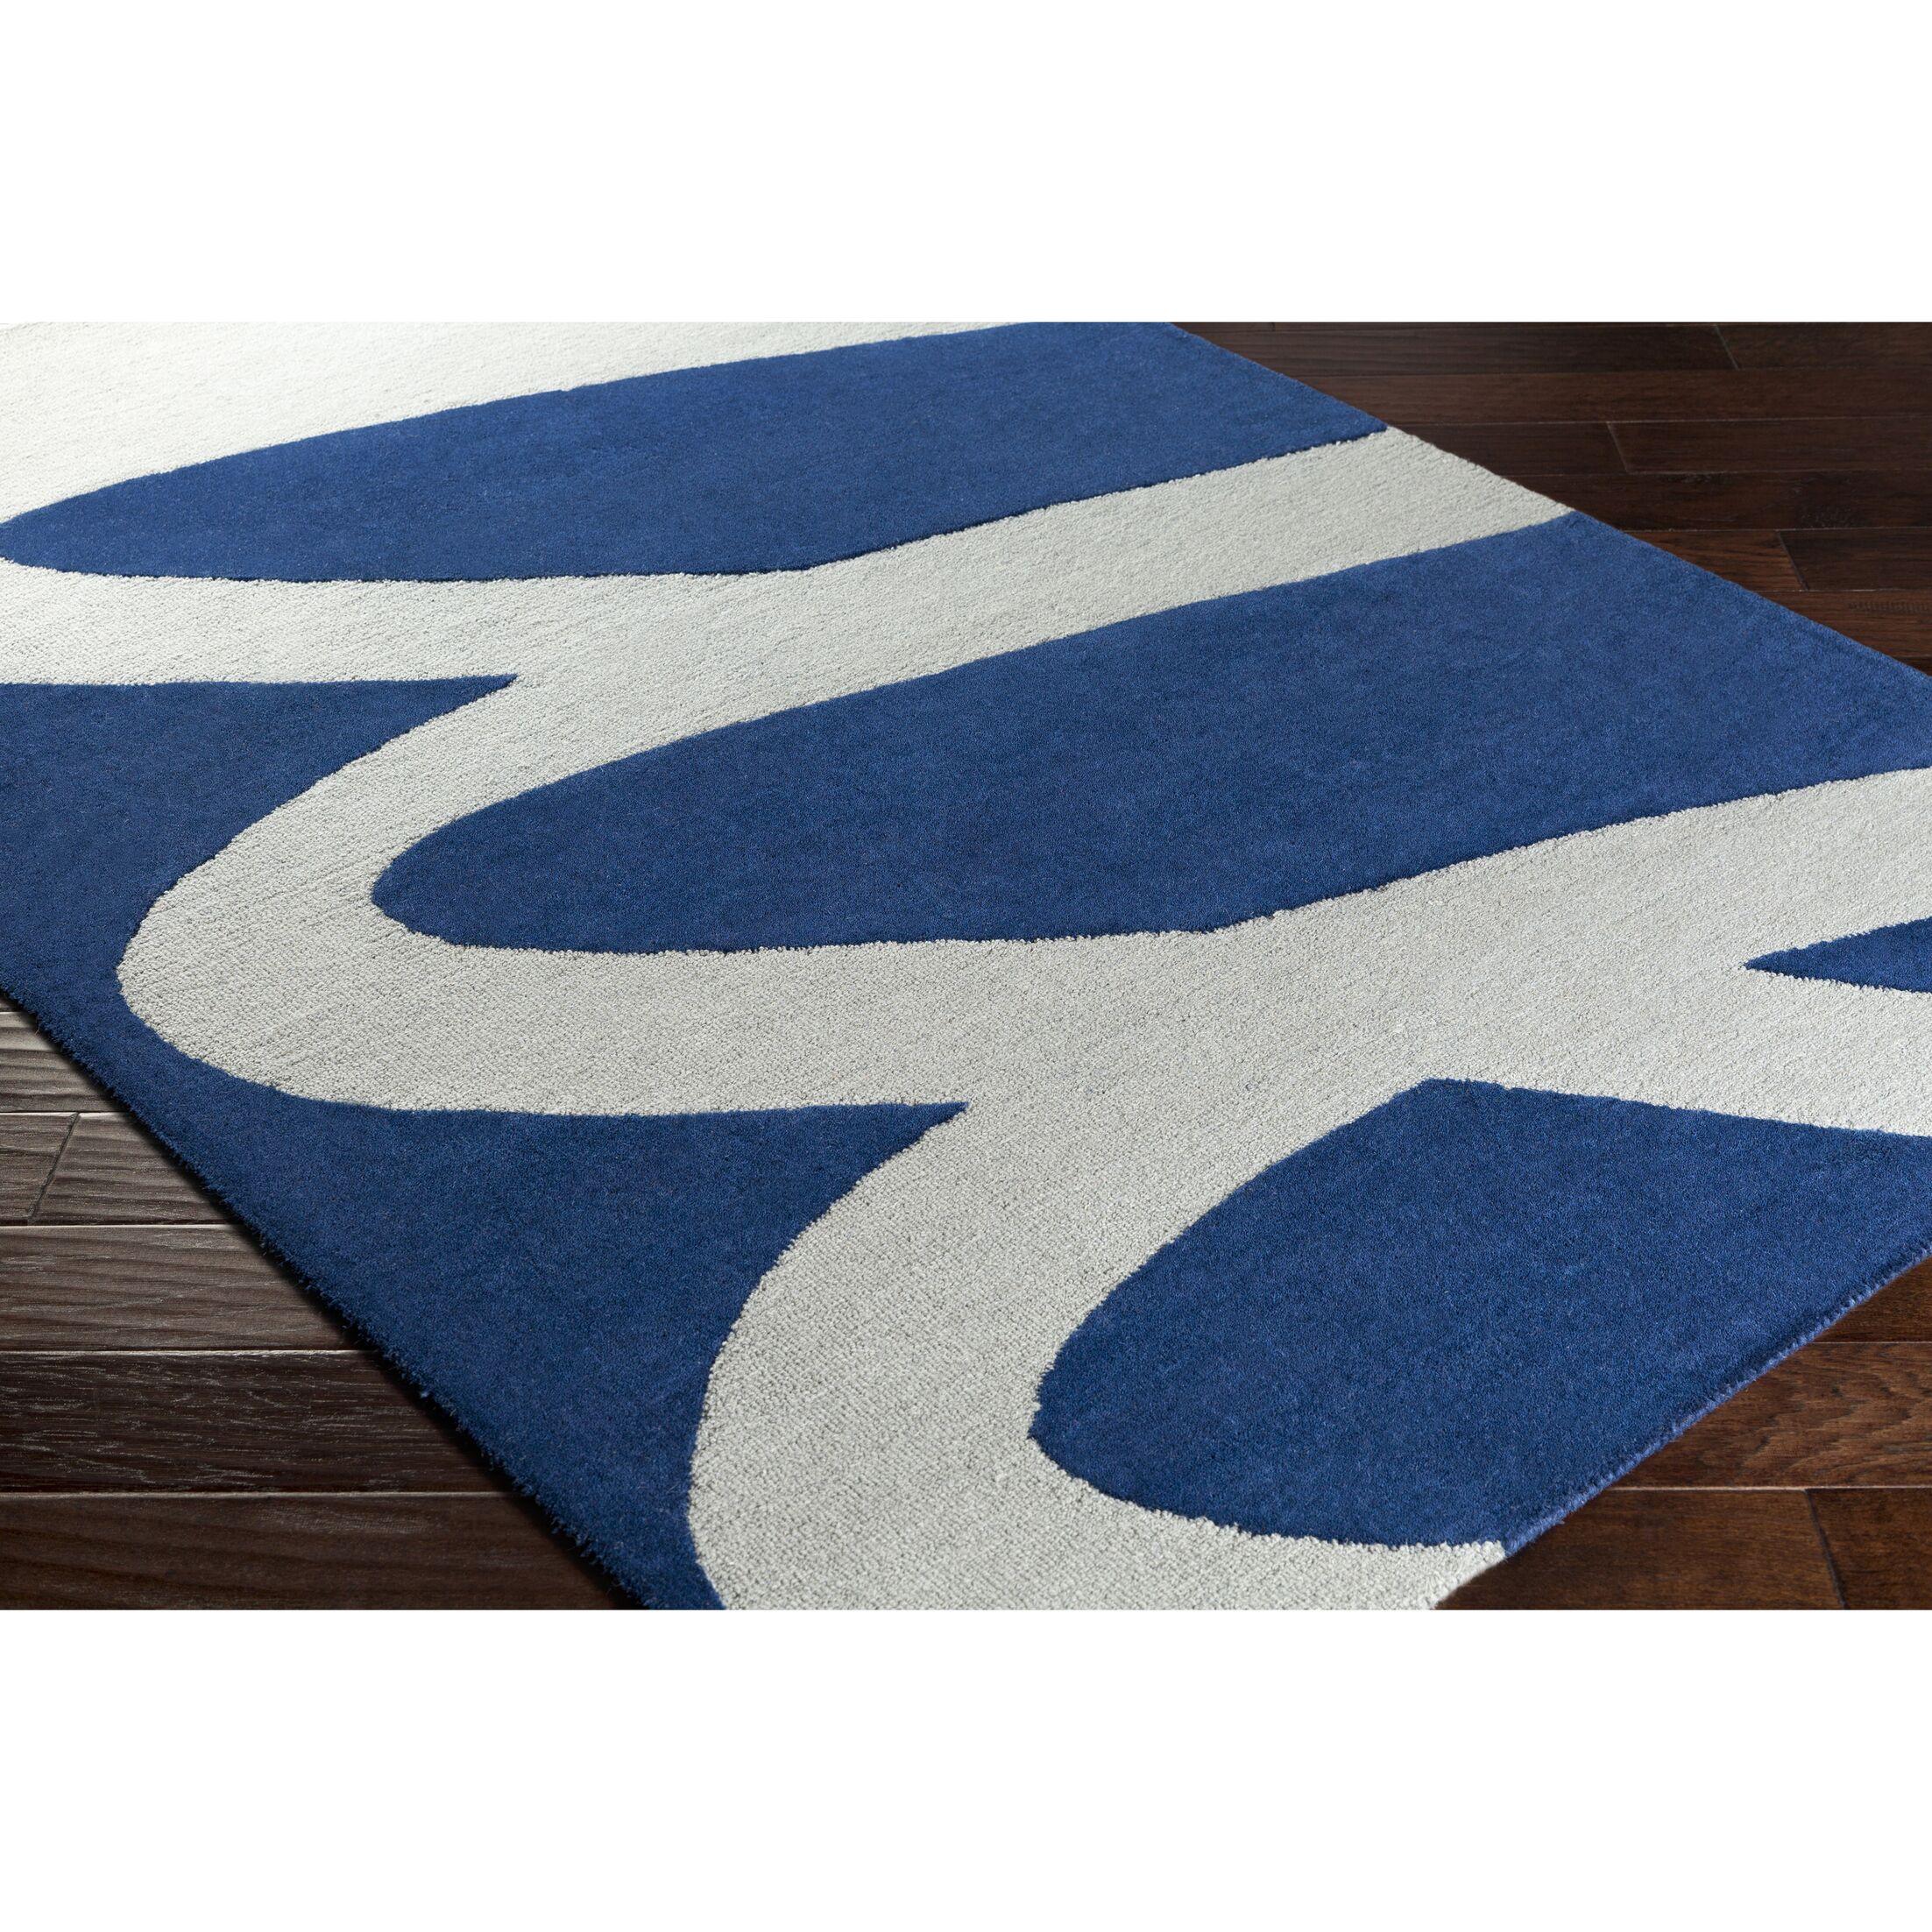 Nida Hand-Tufted Gray/Blue Area Rug Rug Size: Rectangle 8' x 10'